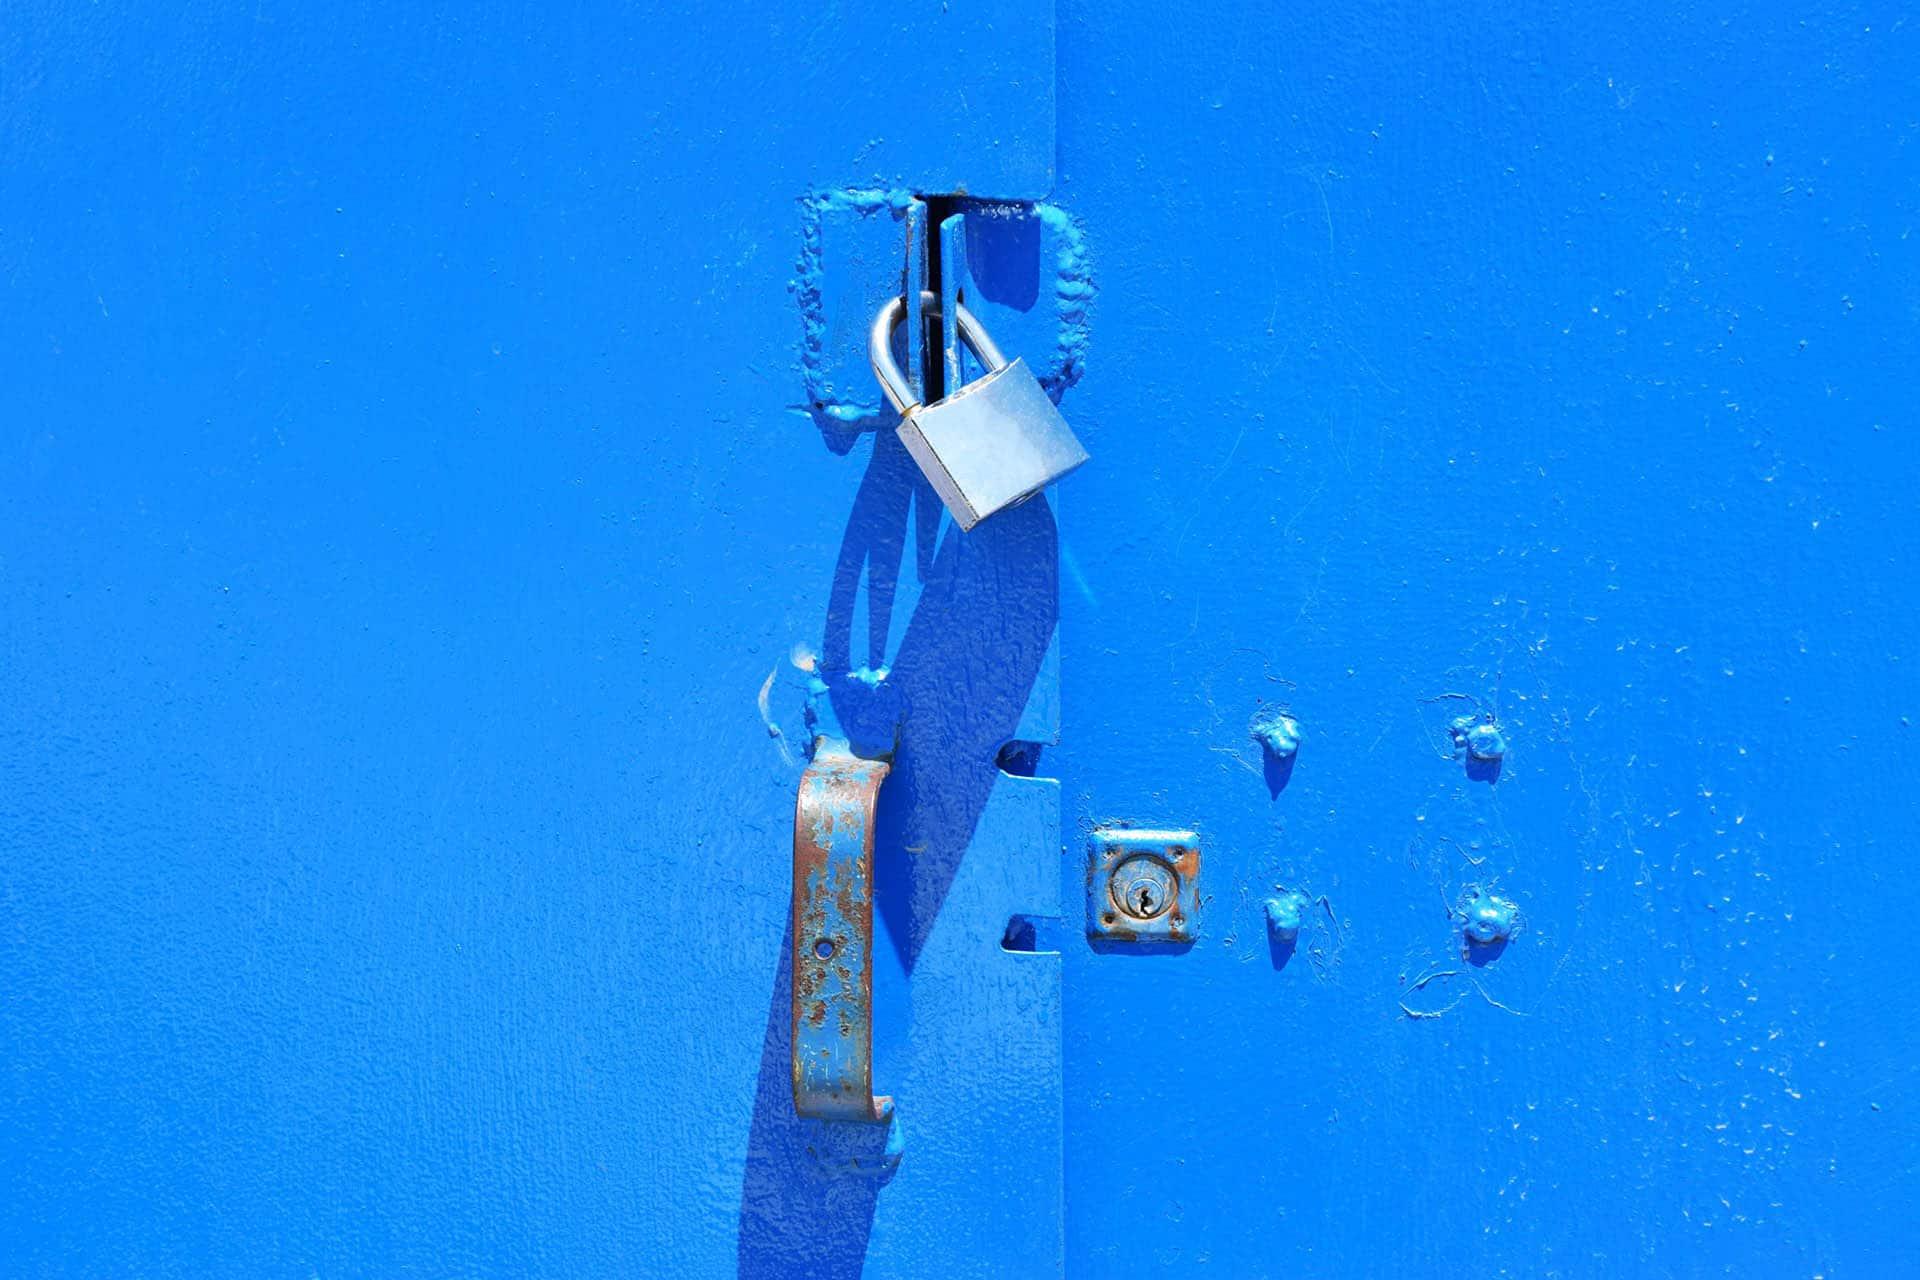 How To Configure Okta's Flexible Security Policies For Your Environment